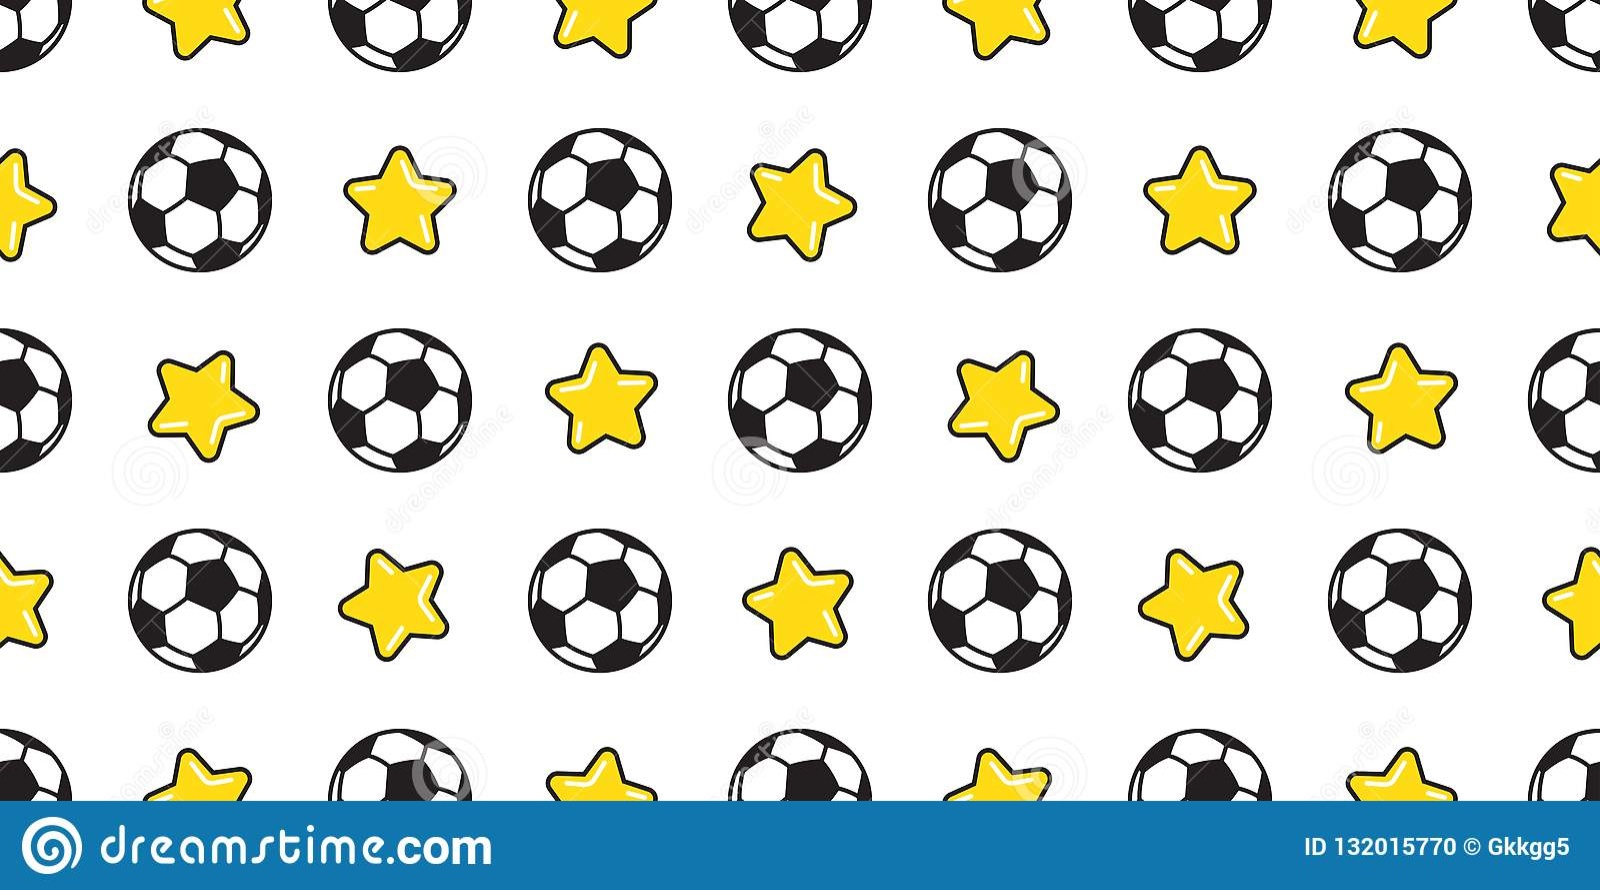 Sport Wallpaper Pattern: Soccer Ball Seamless Pattern Vector Football Star Sport